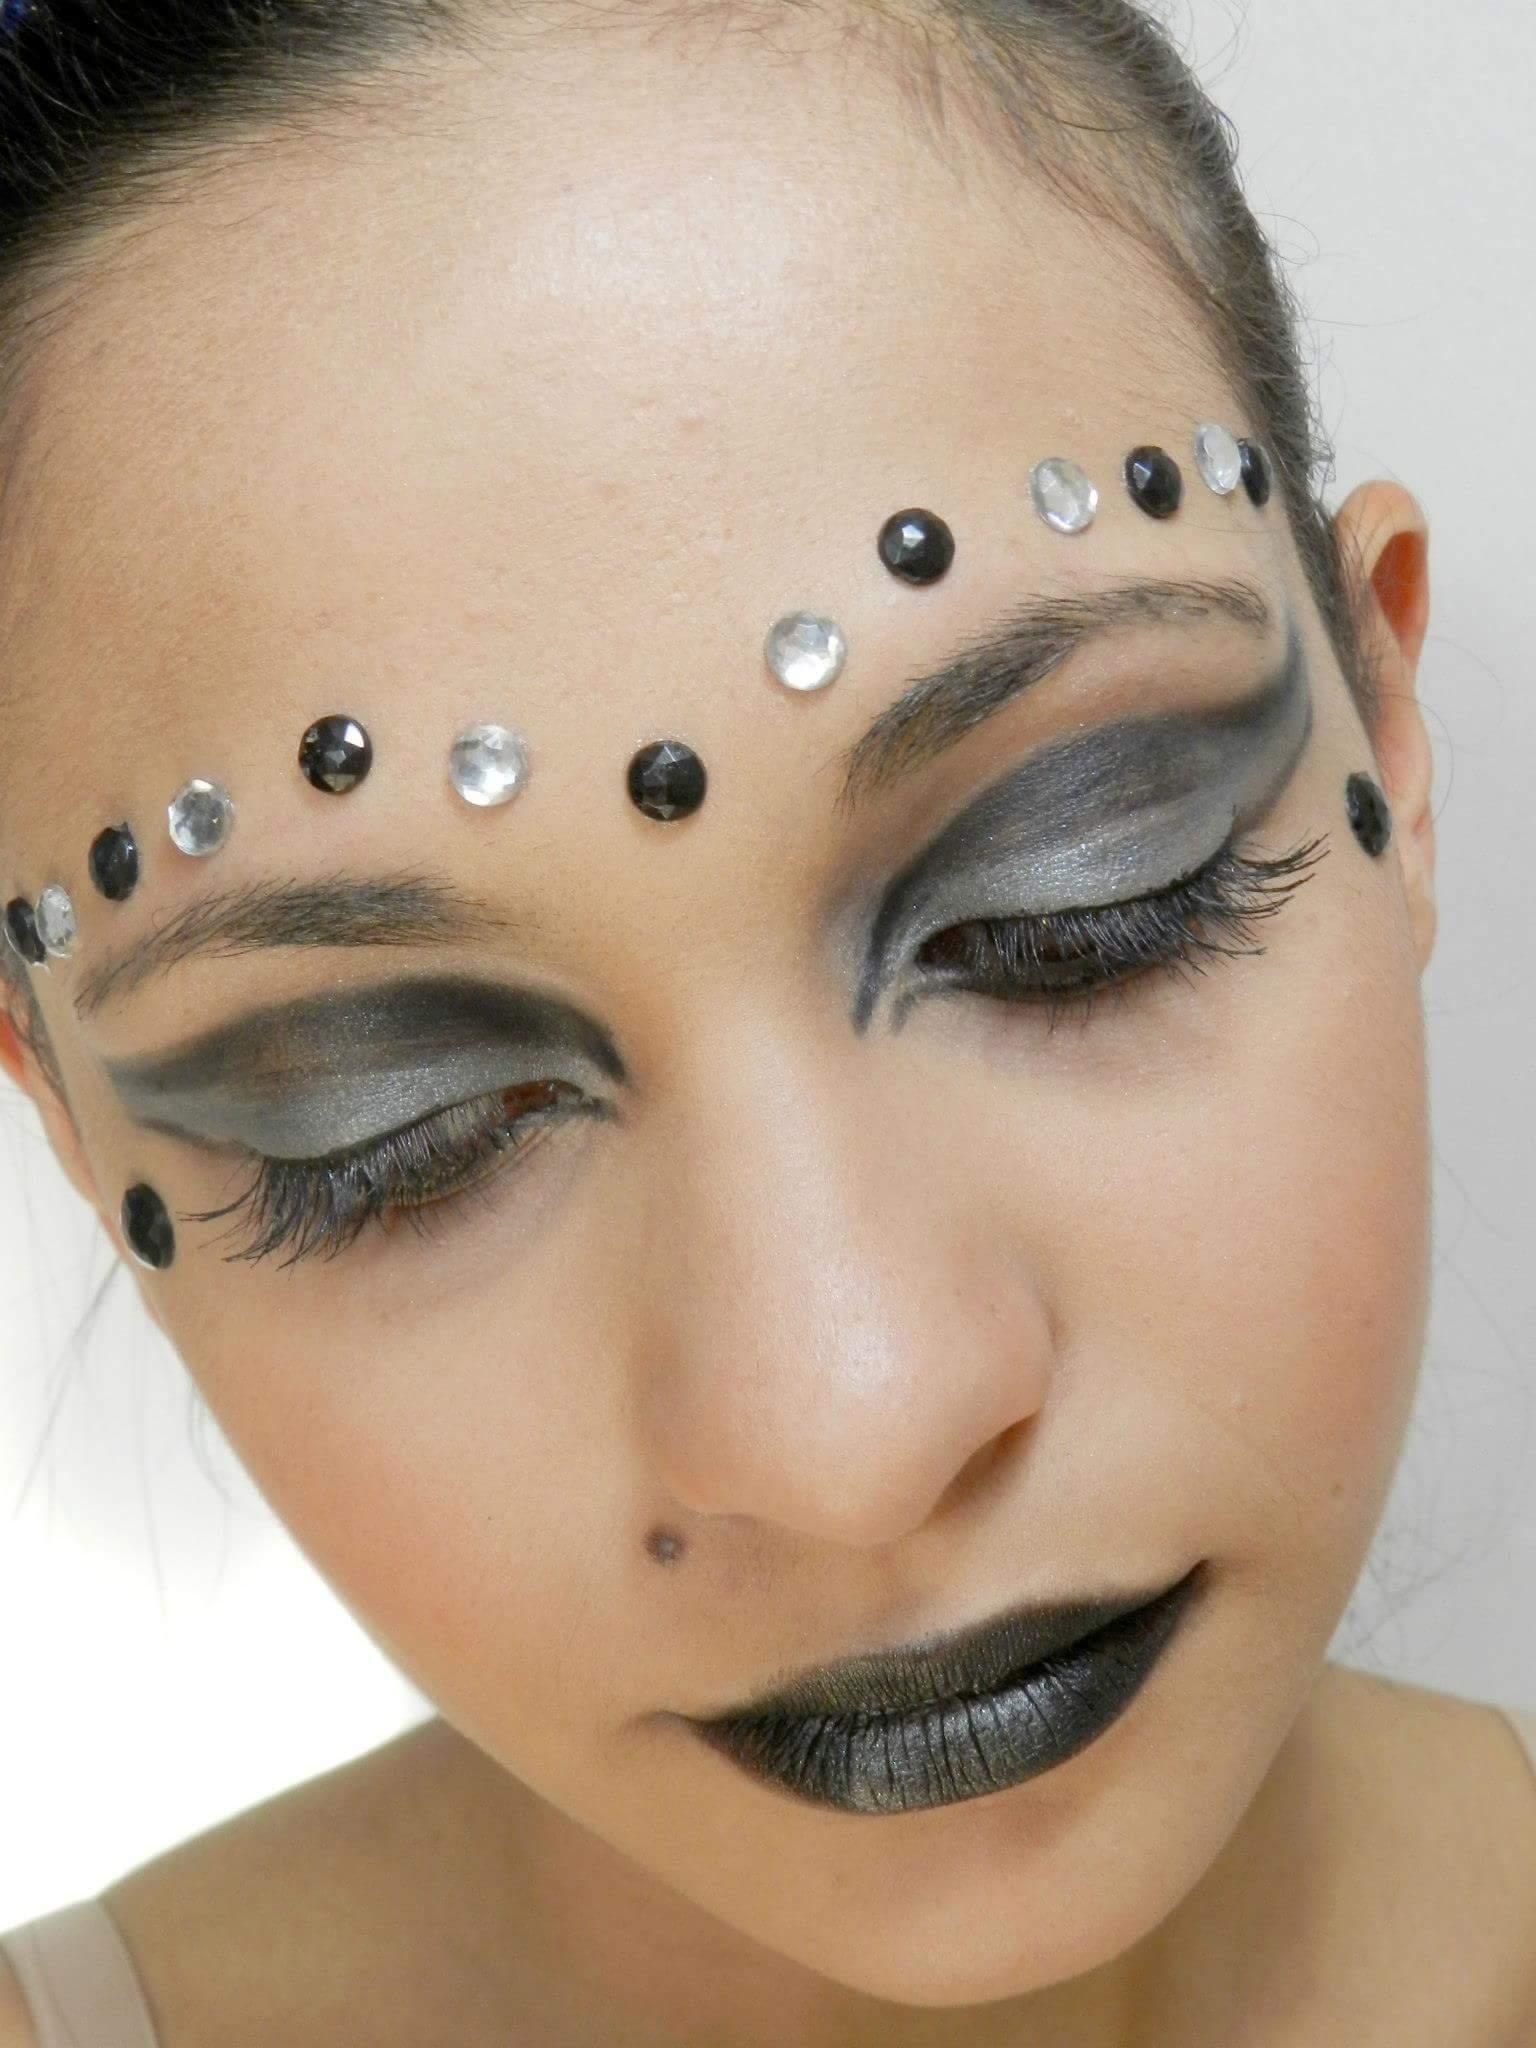 maquiador(a) depilador(a)